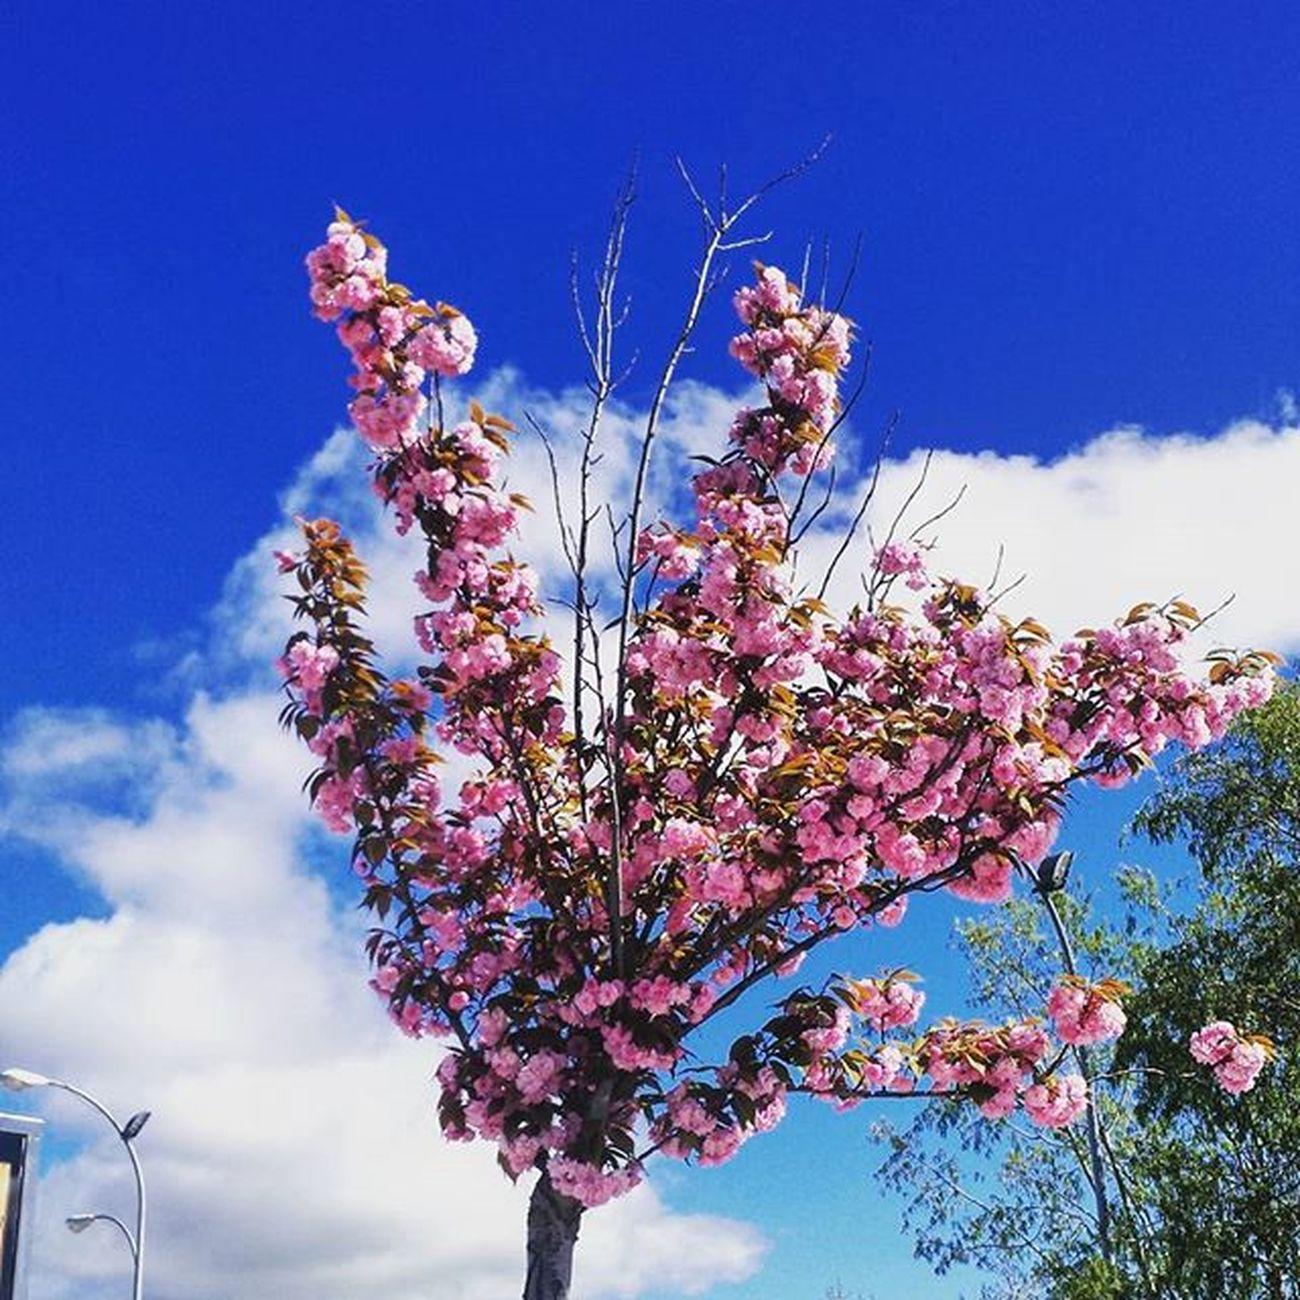 Photography Photo Pamplona Movilgrafias Flores Flowers Pink Primavera Spring Igerspamplona Igersnavarra Naturaleza_navarra Navarragrafias Estaes_navarra Descubriendoigers Anonymous_nature Anonymous_igers Anonymous_es Anonymous_igers_members